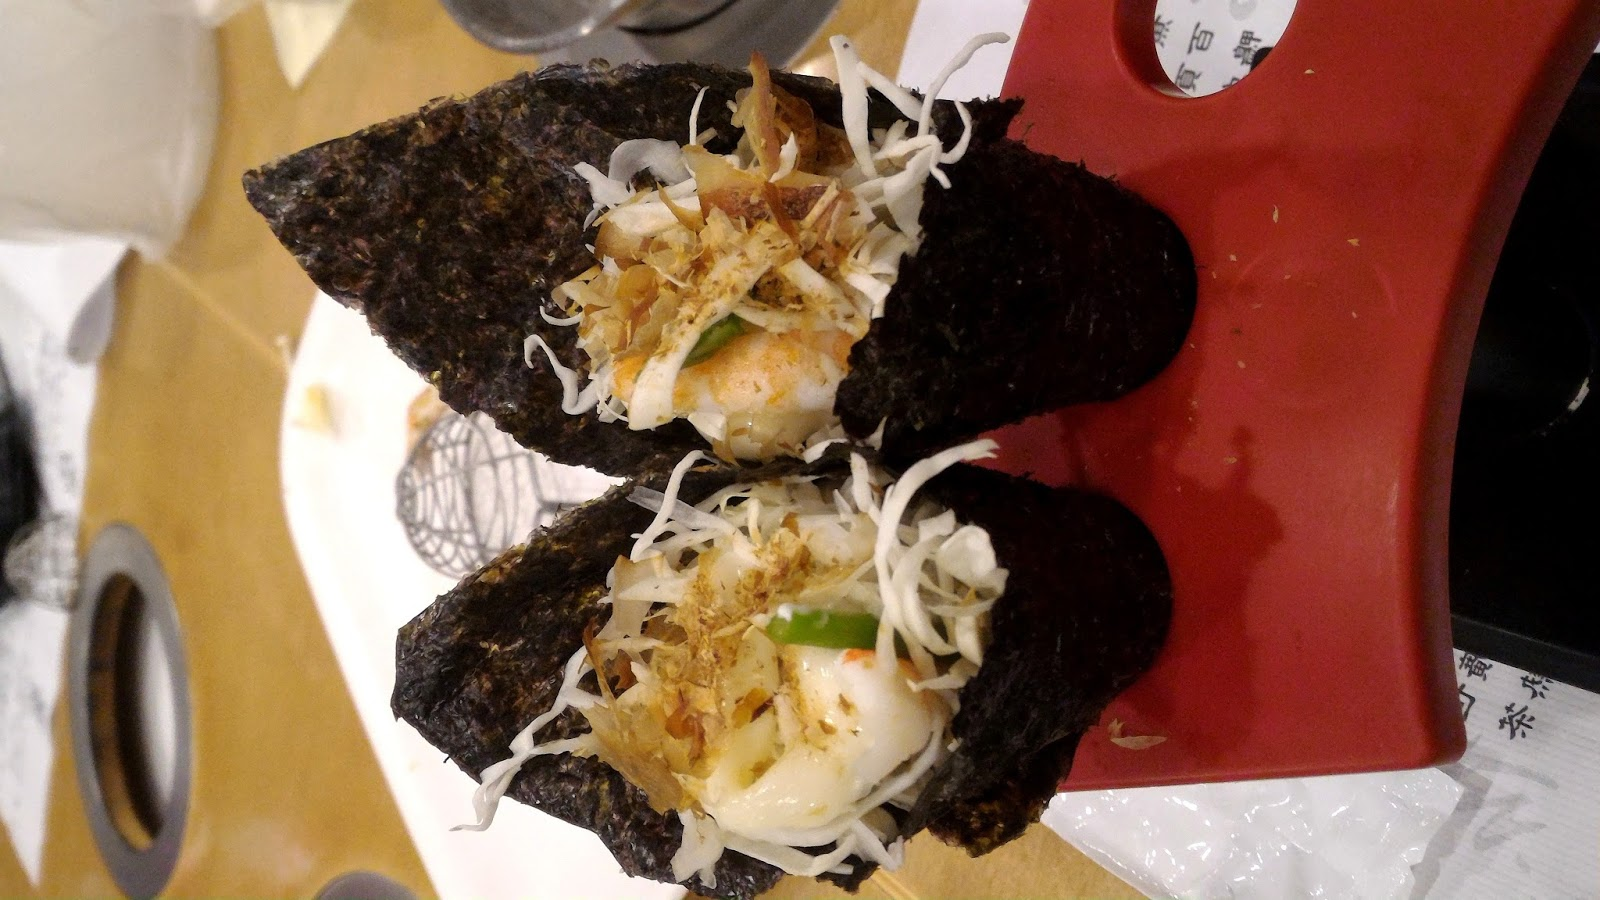 P 20160725 184400 - [食記] 廣香吃到飽日式涮涮鍋,超多種飲料、冰品及甜點!